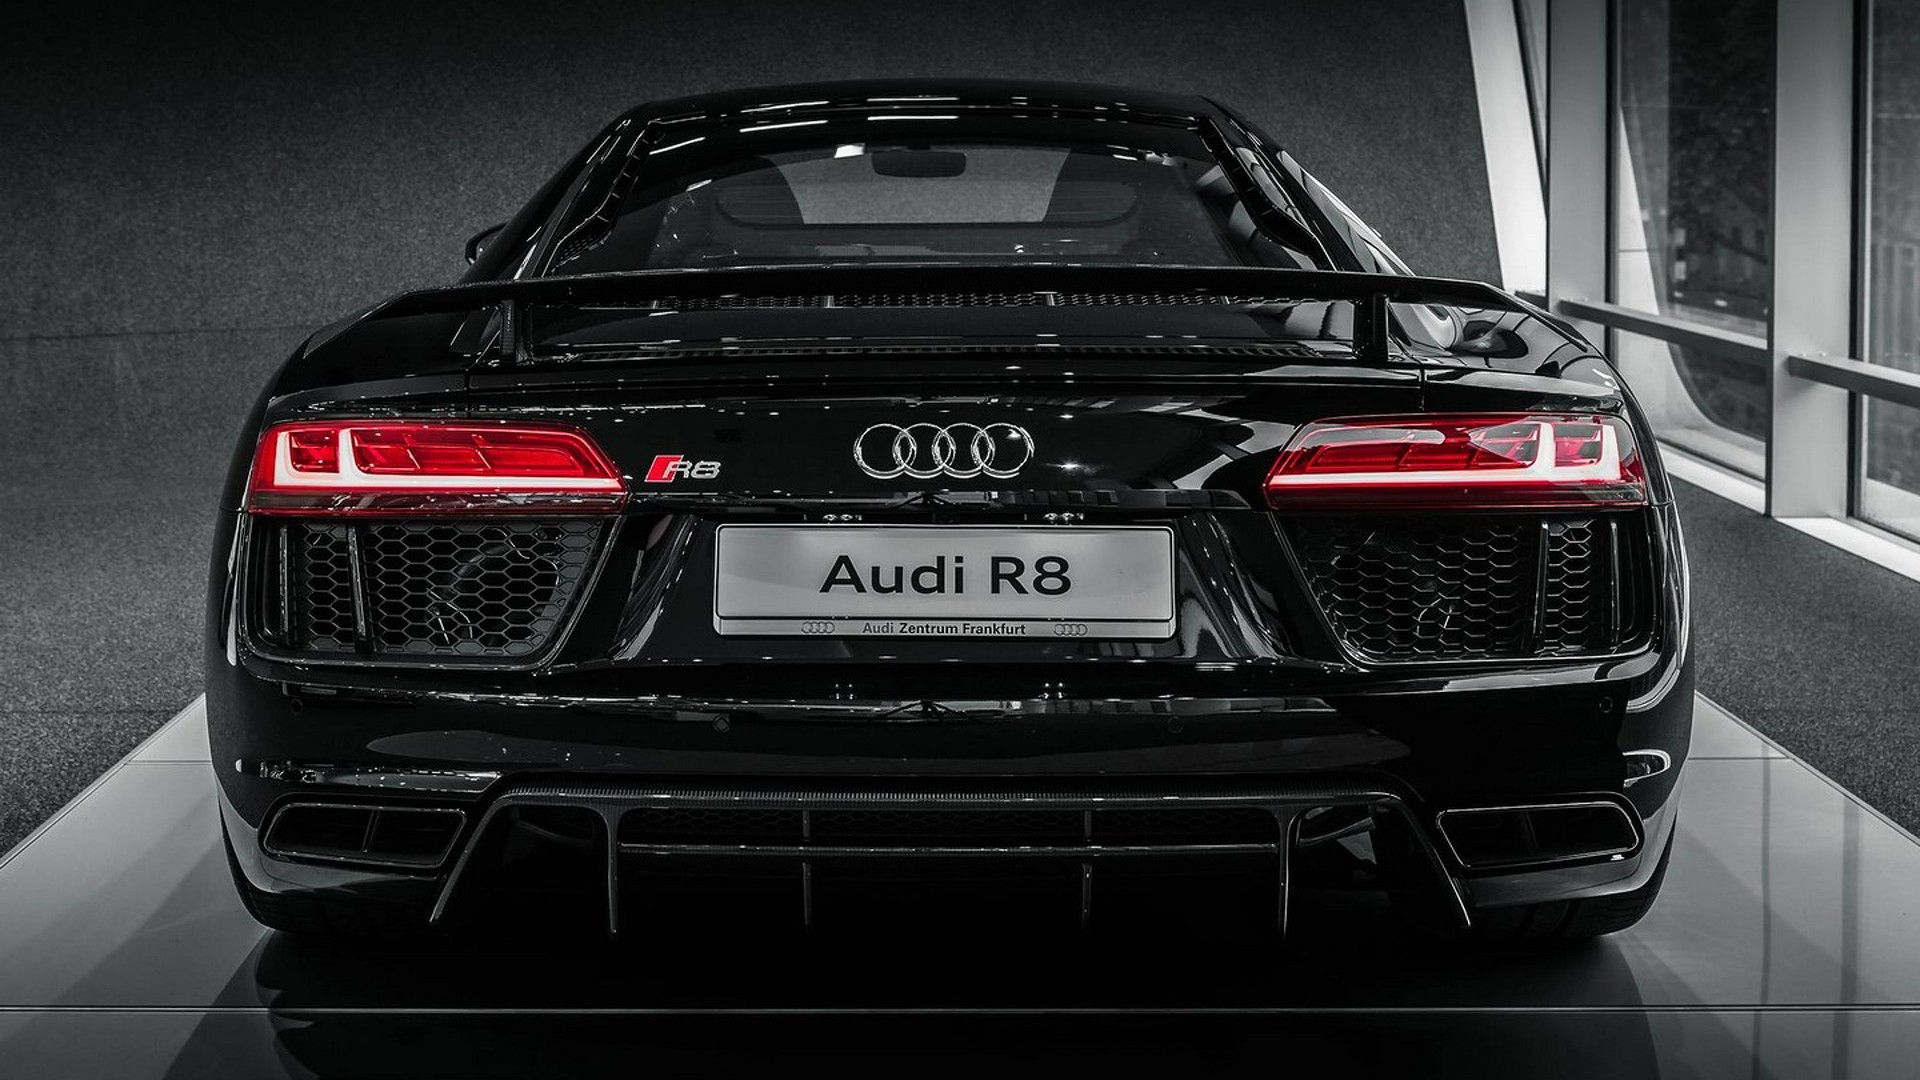 2015 Audi R8 V10 Plus In Mythos Black Looks Mesmerizing In High Quality Photo Shoot